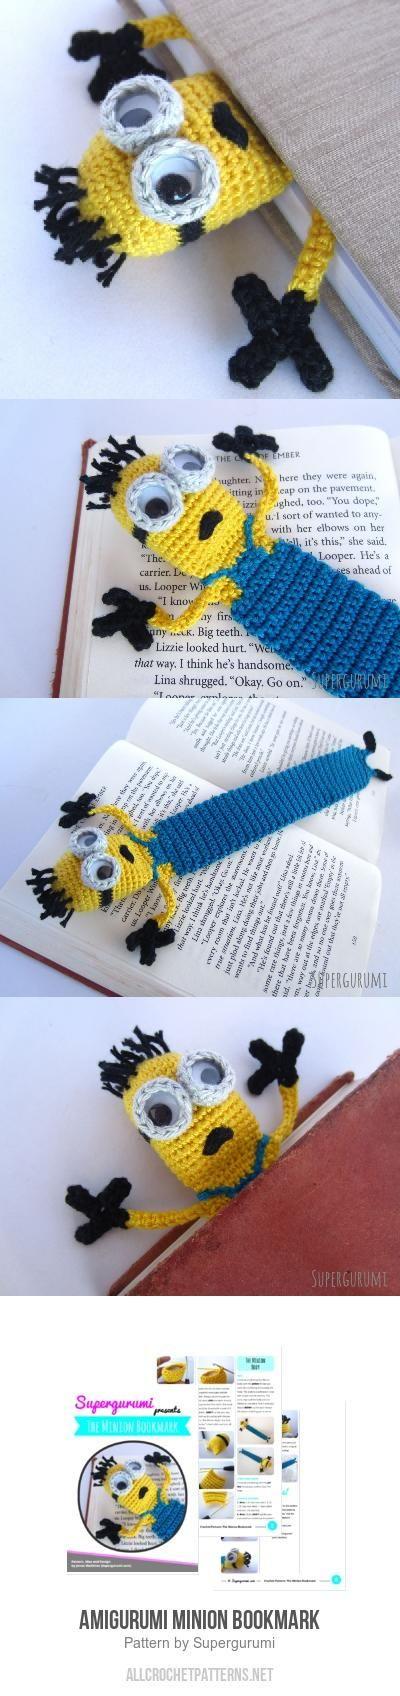 Amigurumi Minion Bookmark Crochet Pattern for purchase